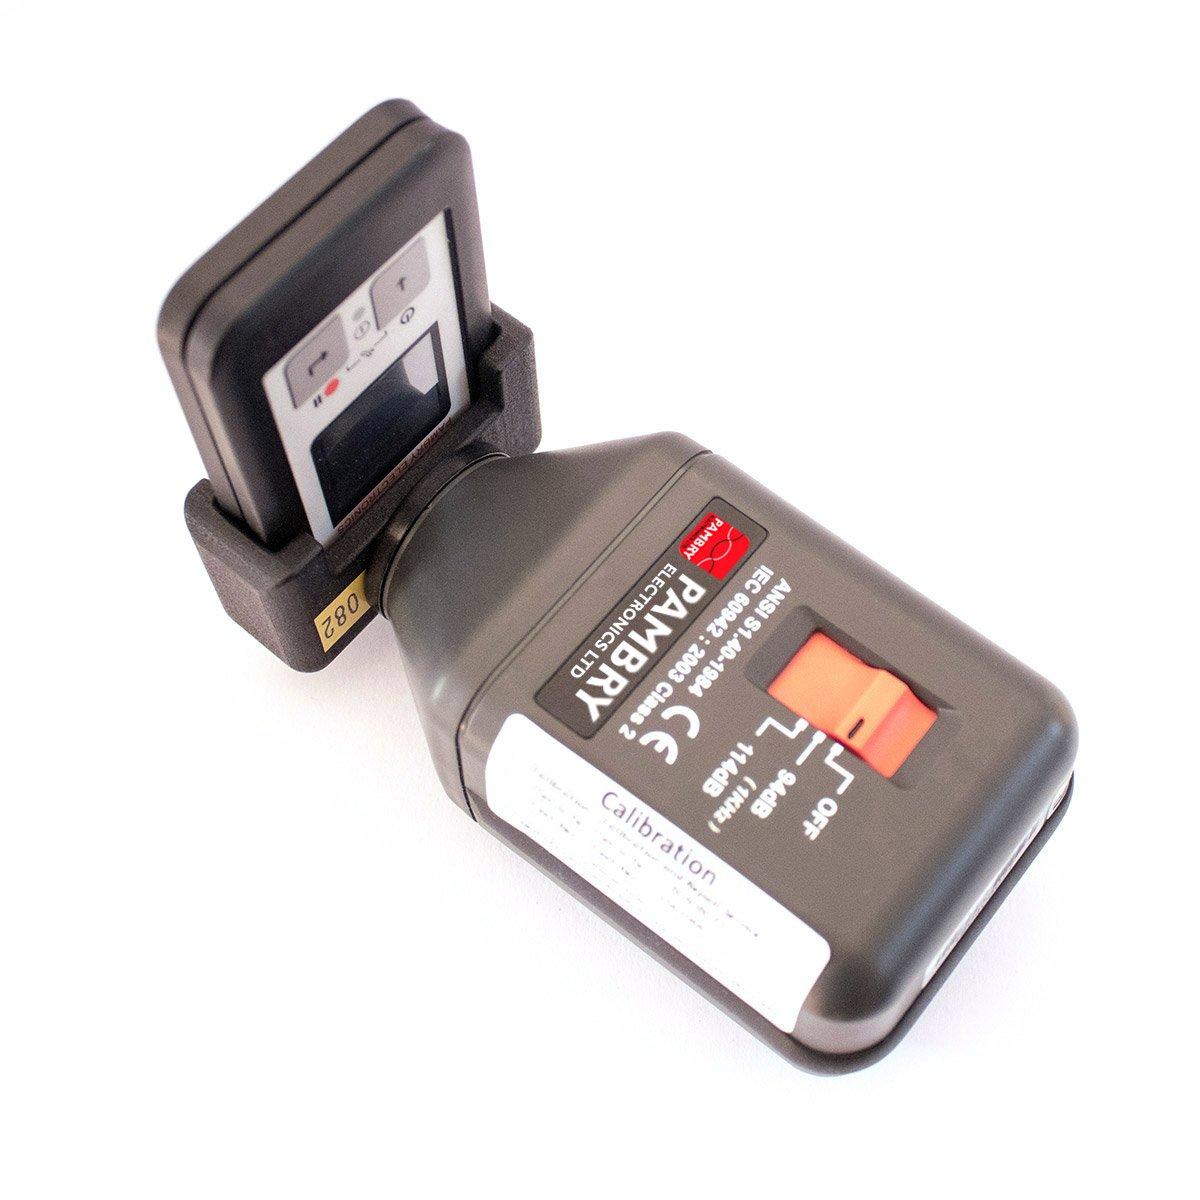 Listen Ear™ Internal Microphone Calibrator Adapter and Calibrator assembled with Listen Ear™